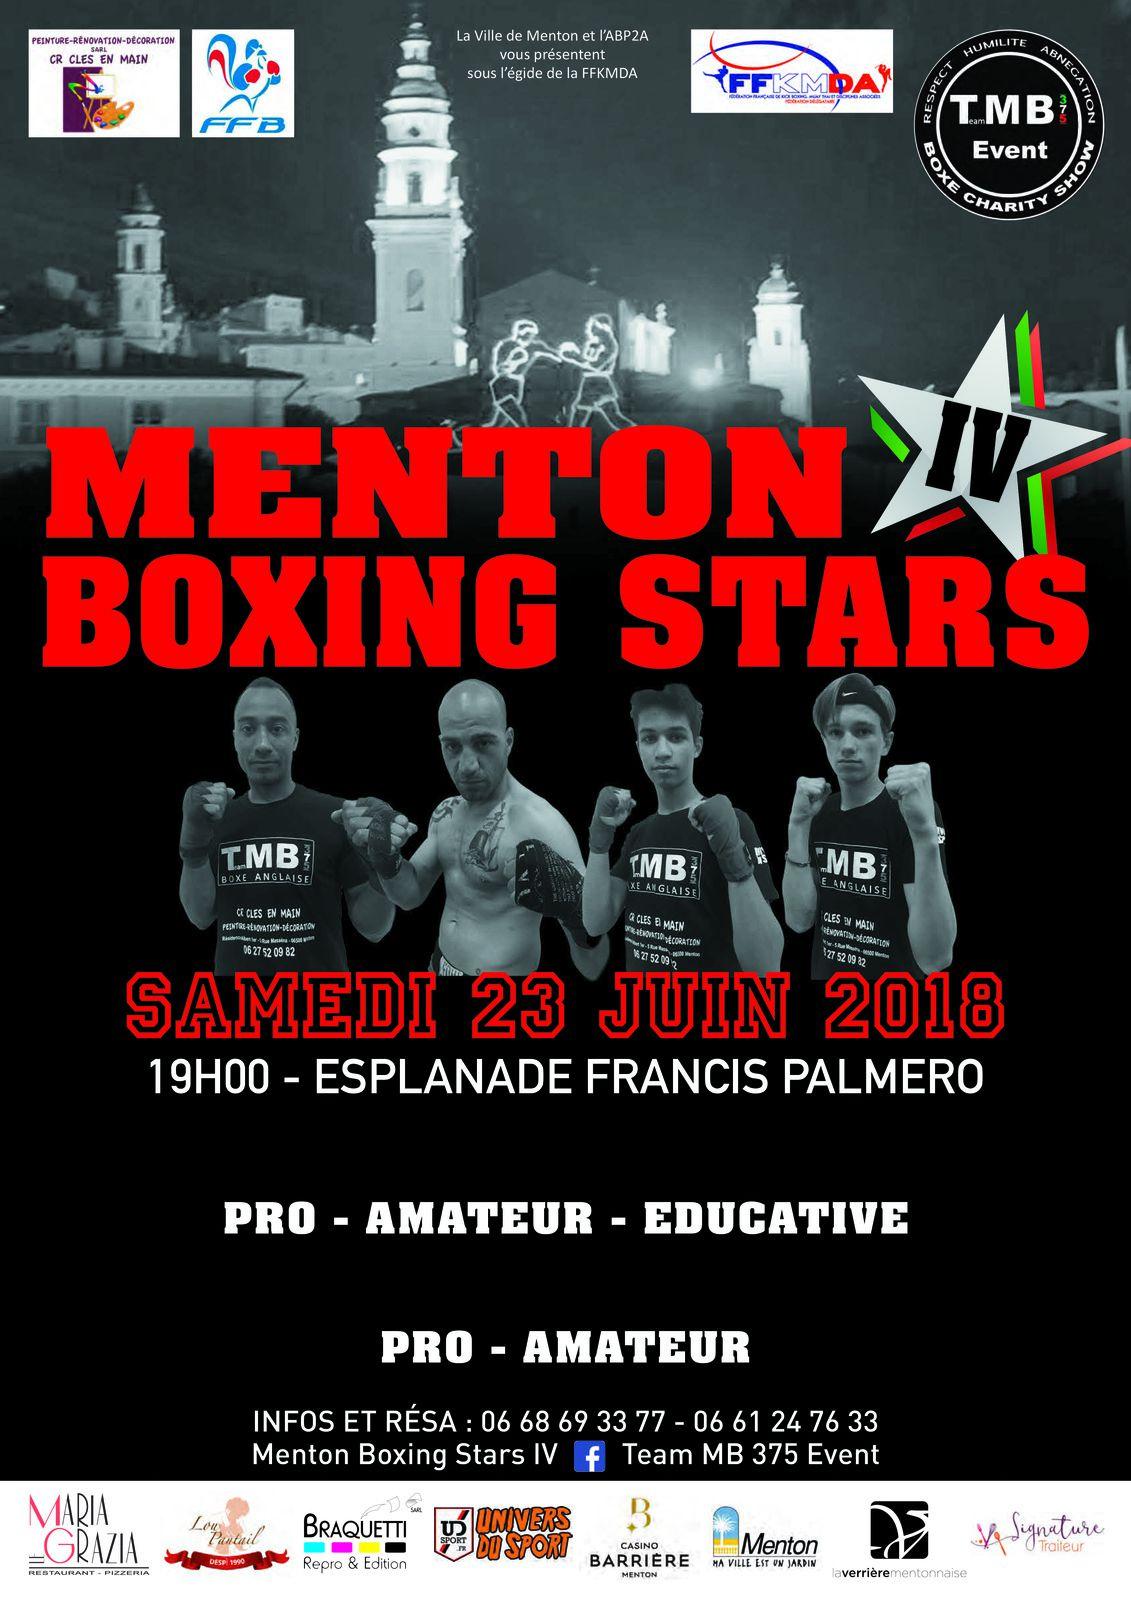 MENTON BOXING STARS: GALA ESTIVAL DU TEAM MB 375